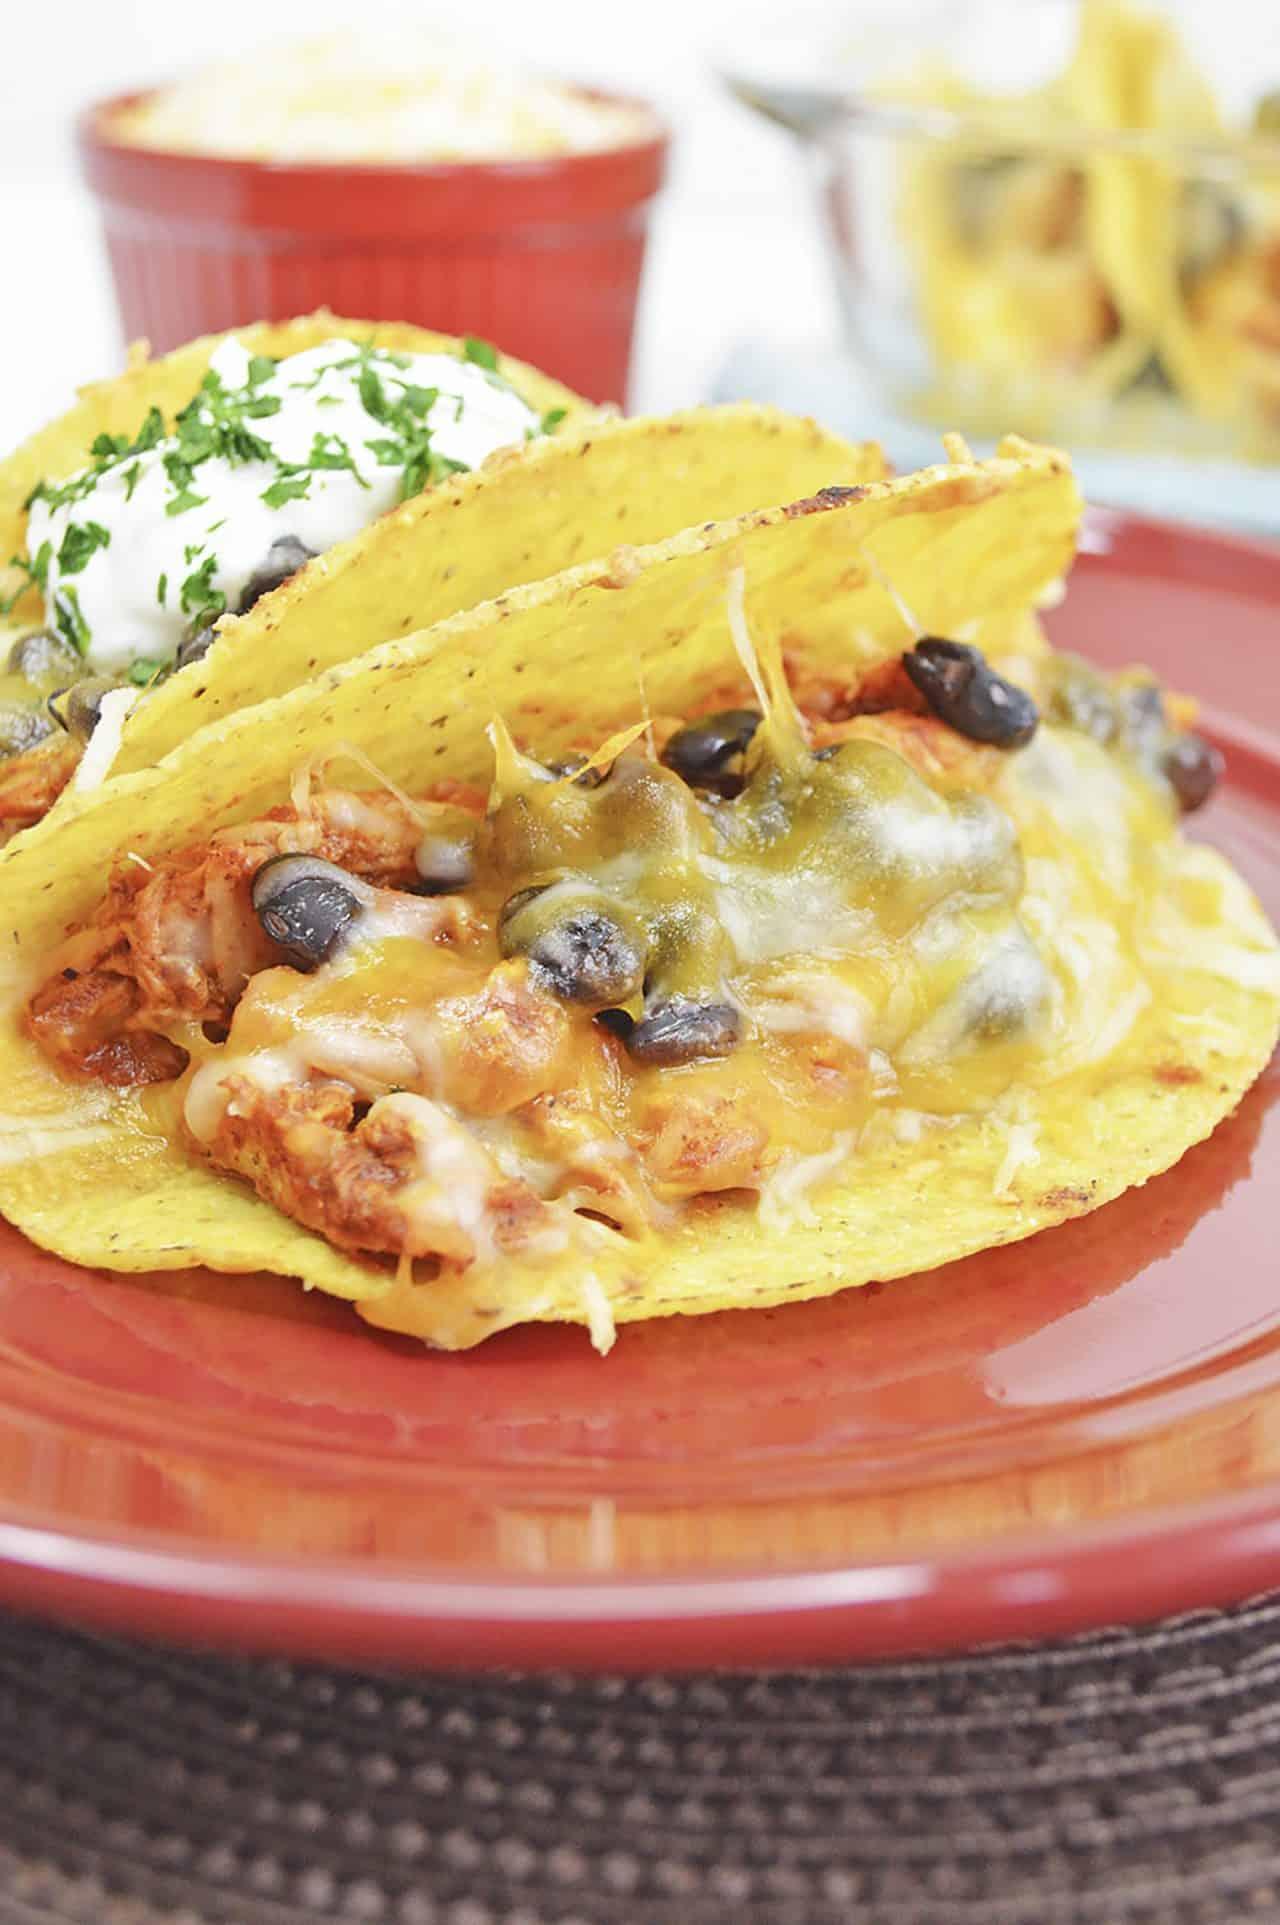 Chicken and Black Bean Tacos – Uses Rotisserie or Leftover Shredded Chicken!